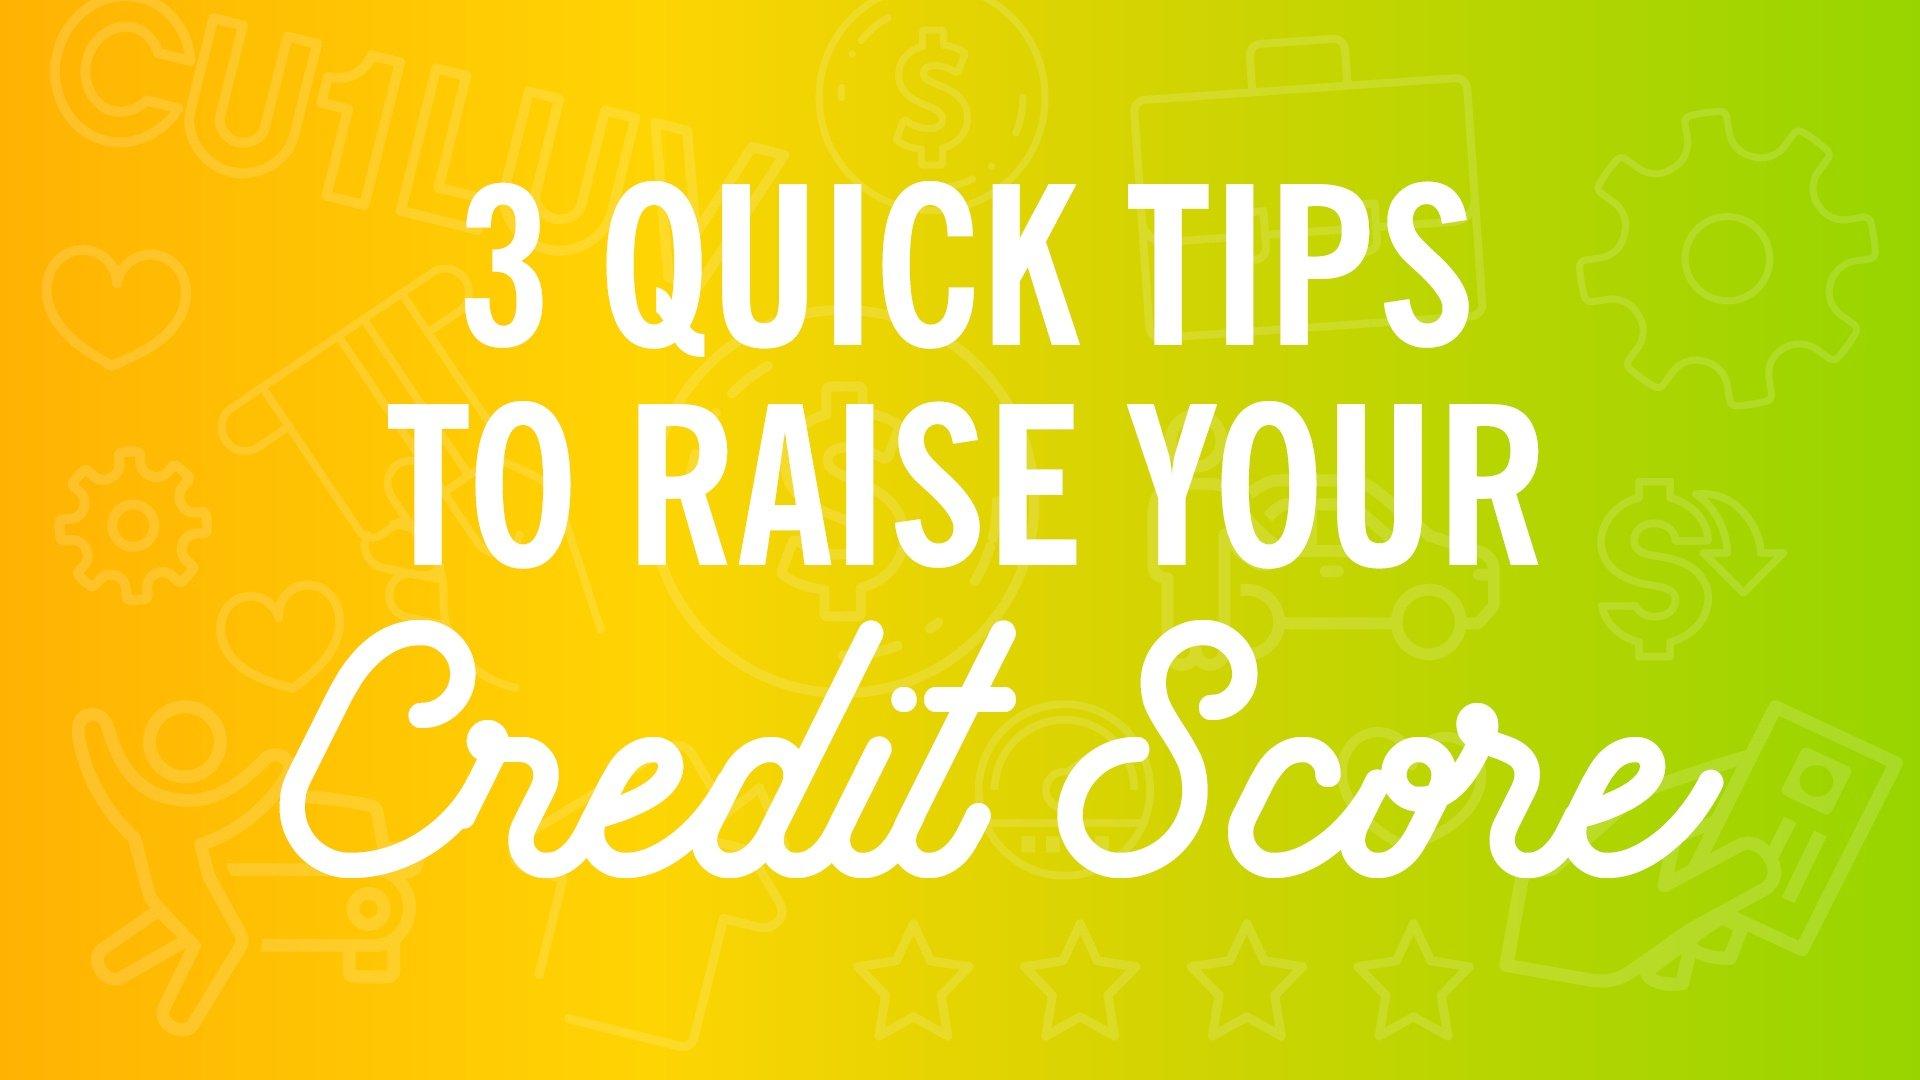 blog-savvymoney-3-quick-tips-to-raise-your-credit-score